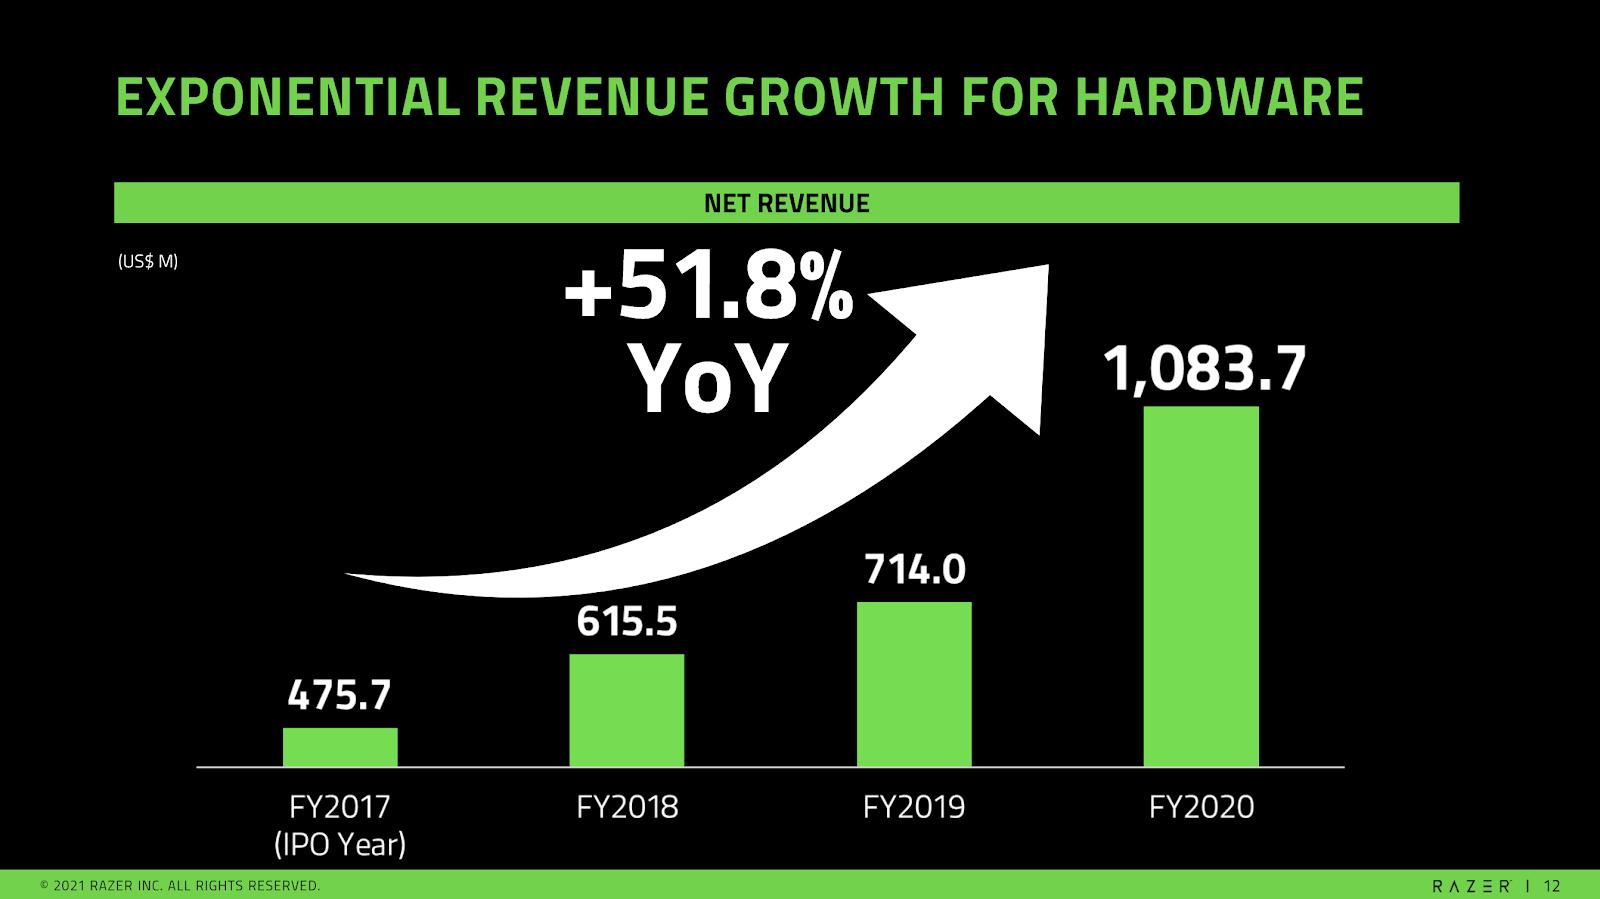 https://mk0thesmartinve6fs8d.kinstacdn.com/wp-content/uploads/2021/03/Razer-Revenue-Growth.png